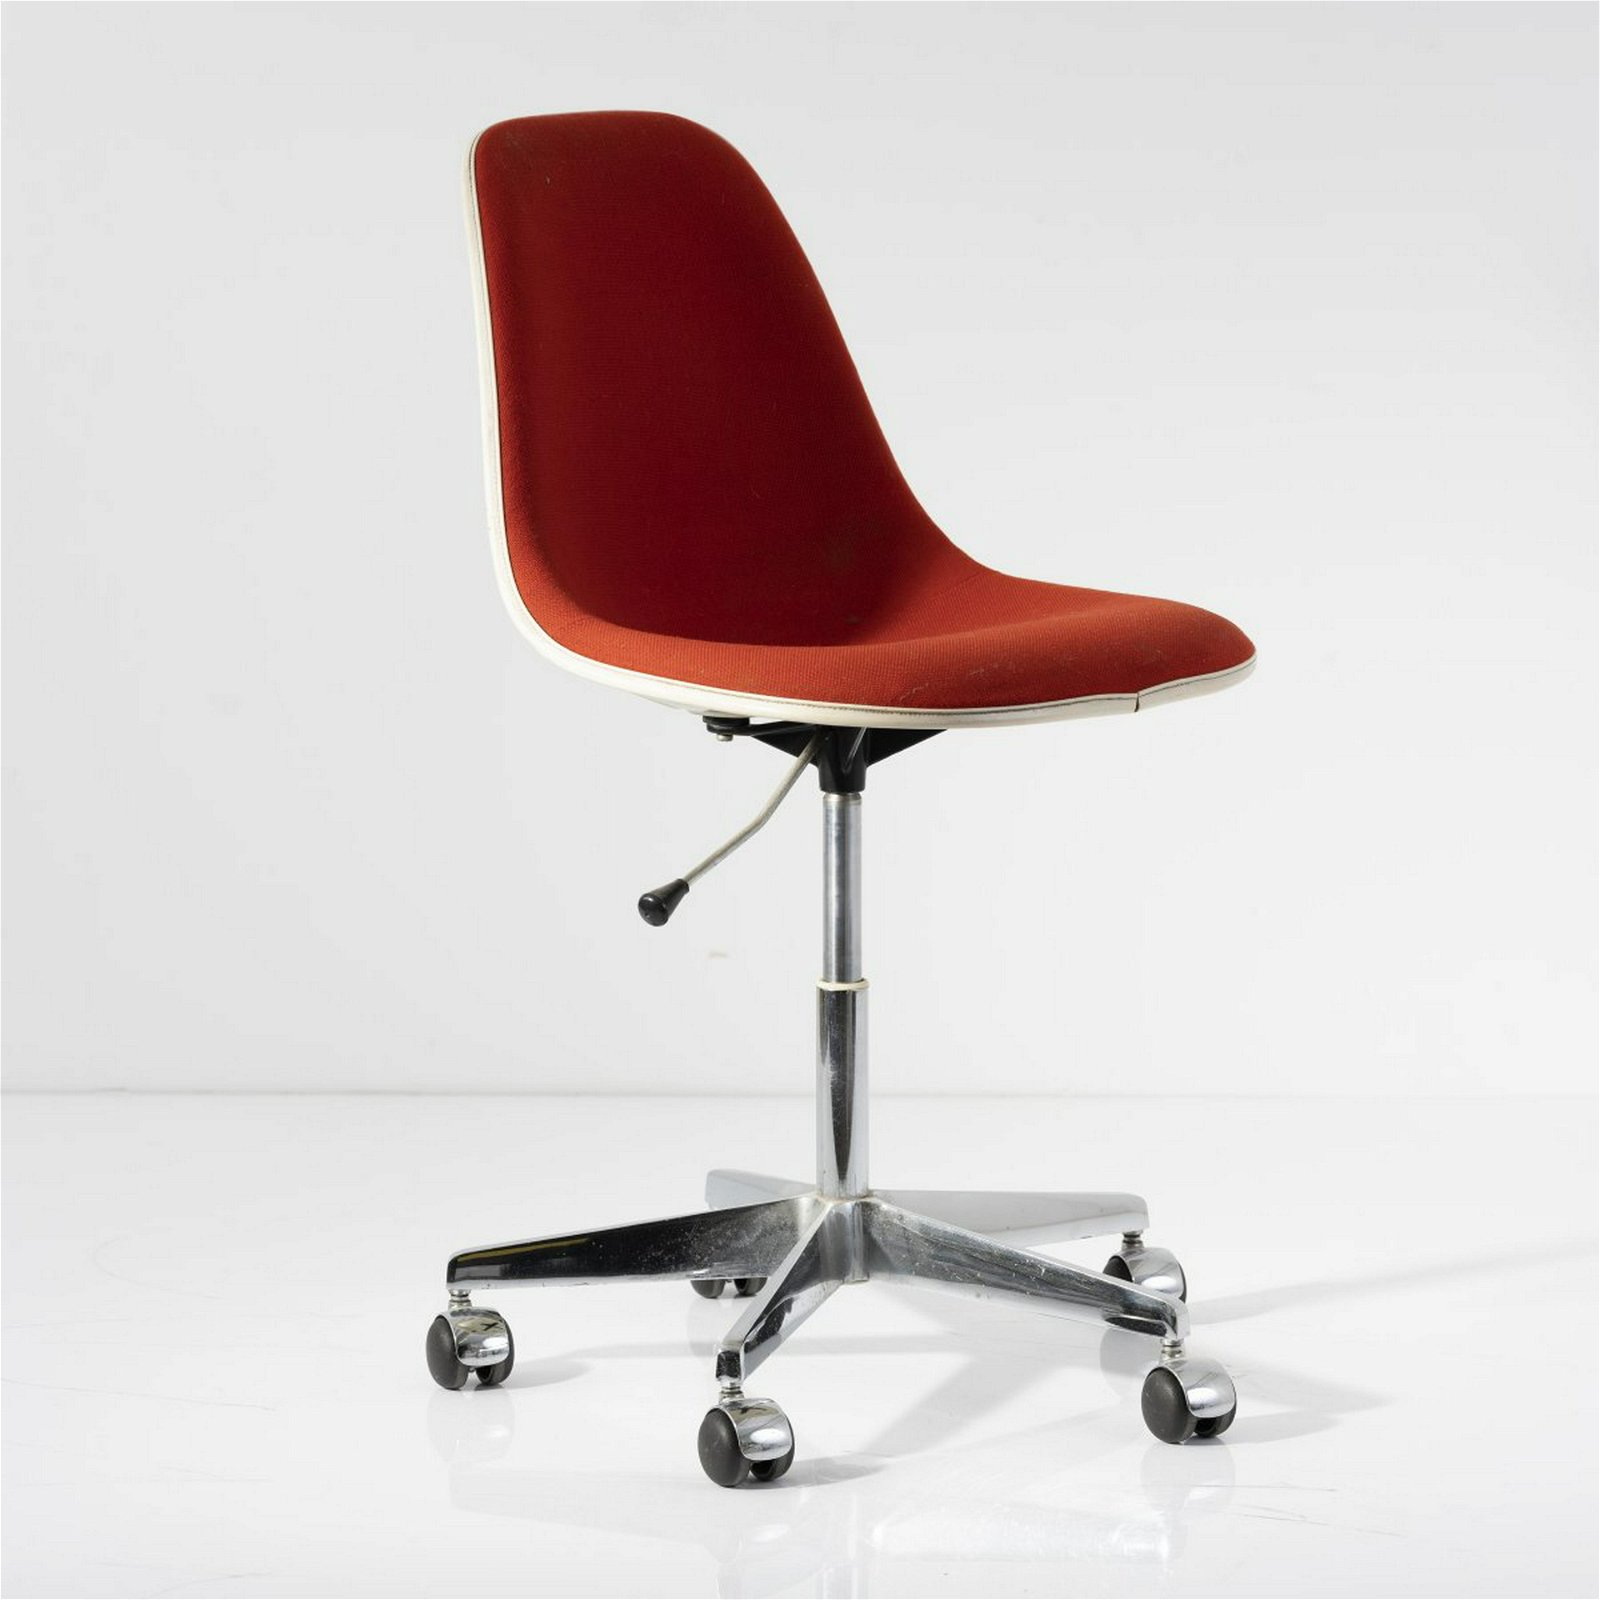 Charles Eames, 'PSCC' desk chair, 1970